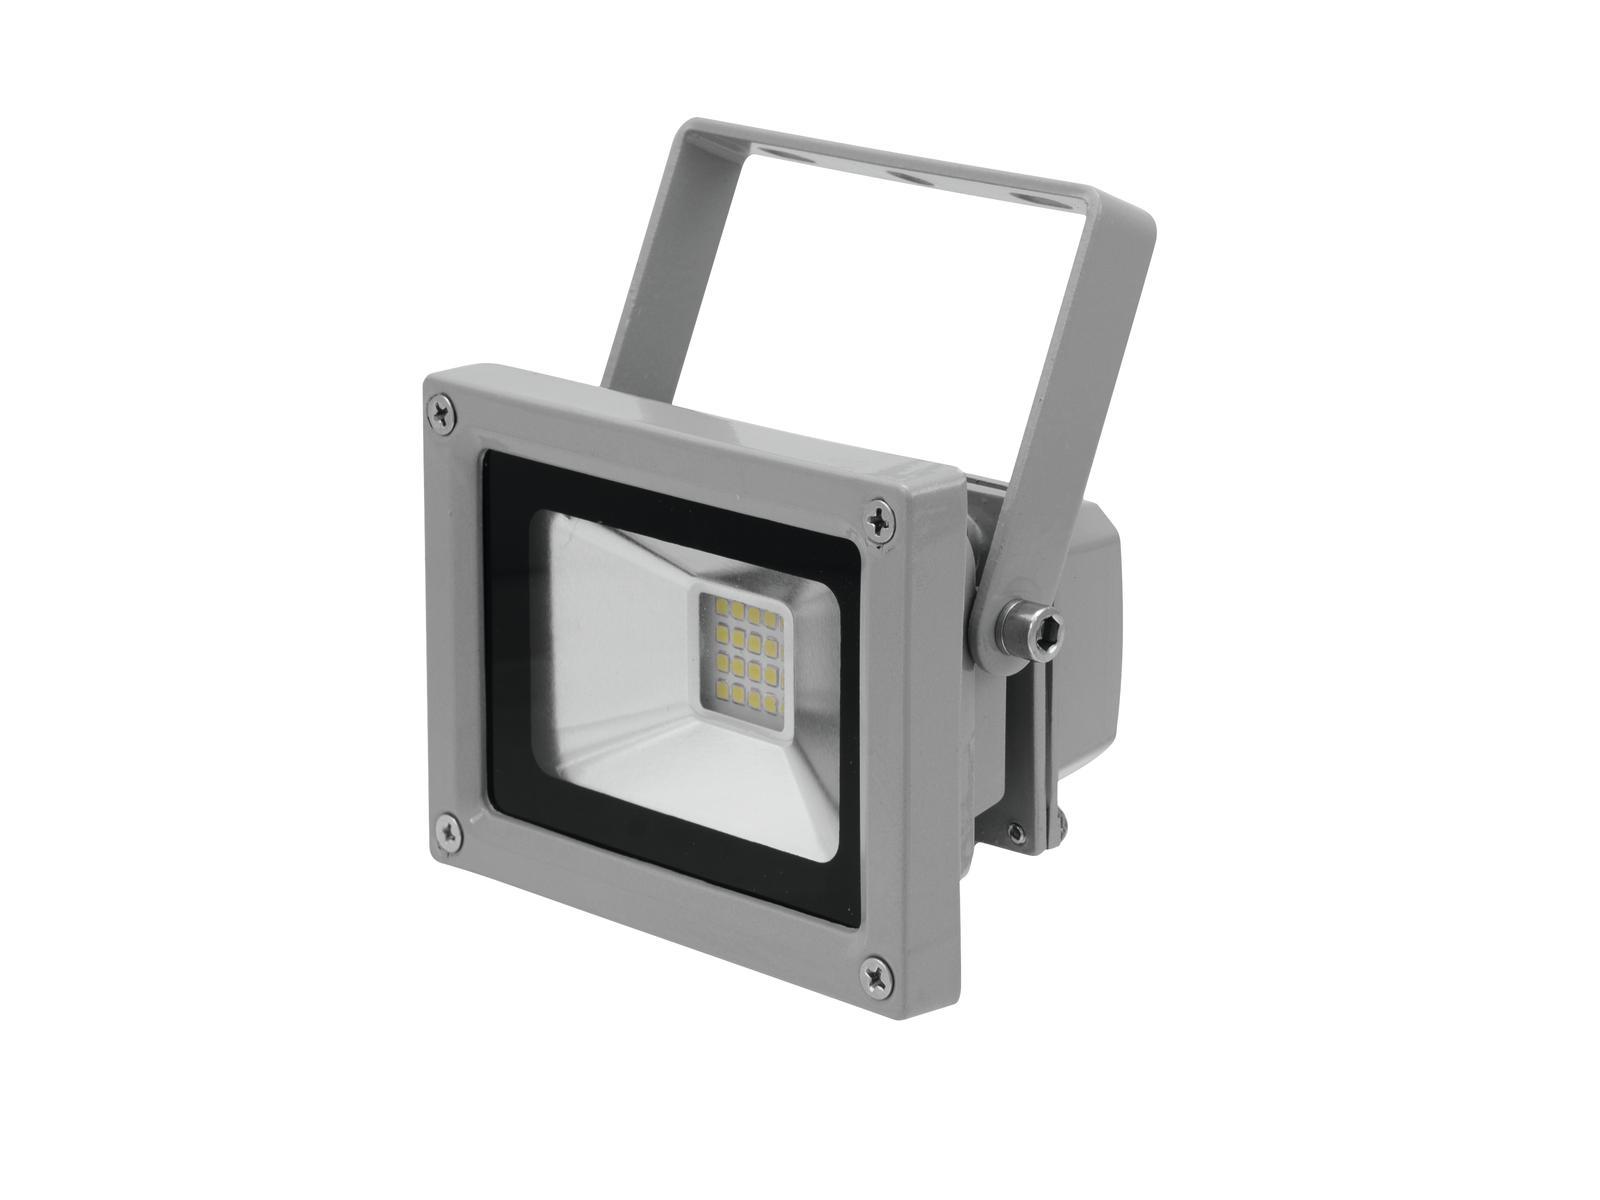 Eurolite LED reflektor IP FL-10, 20x0,6W LED, 6400K, 120, IP54